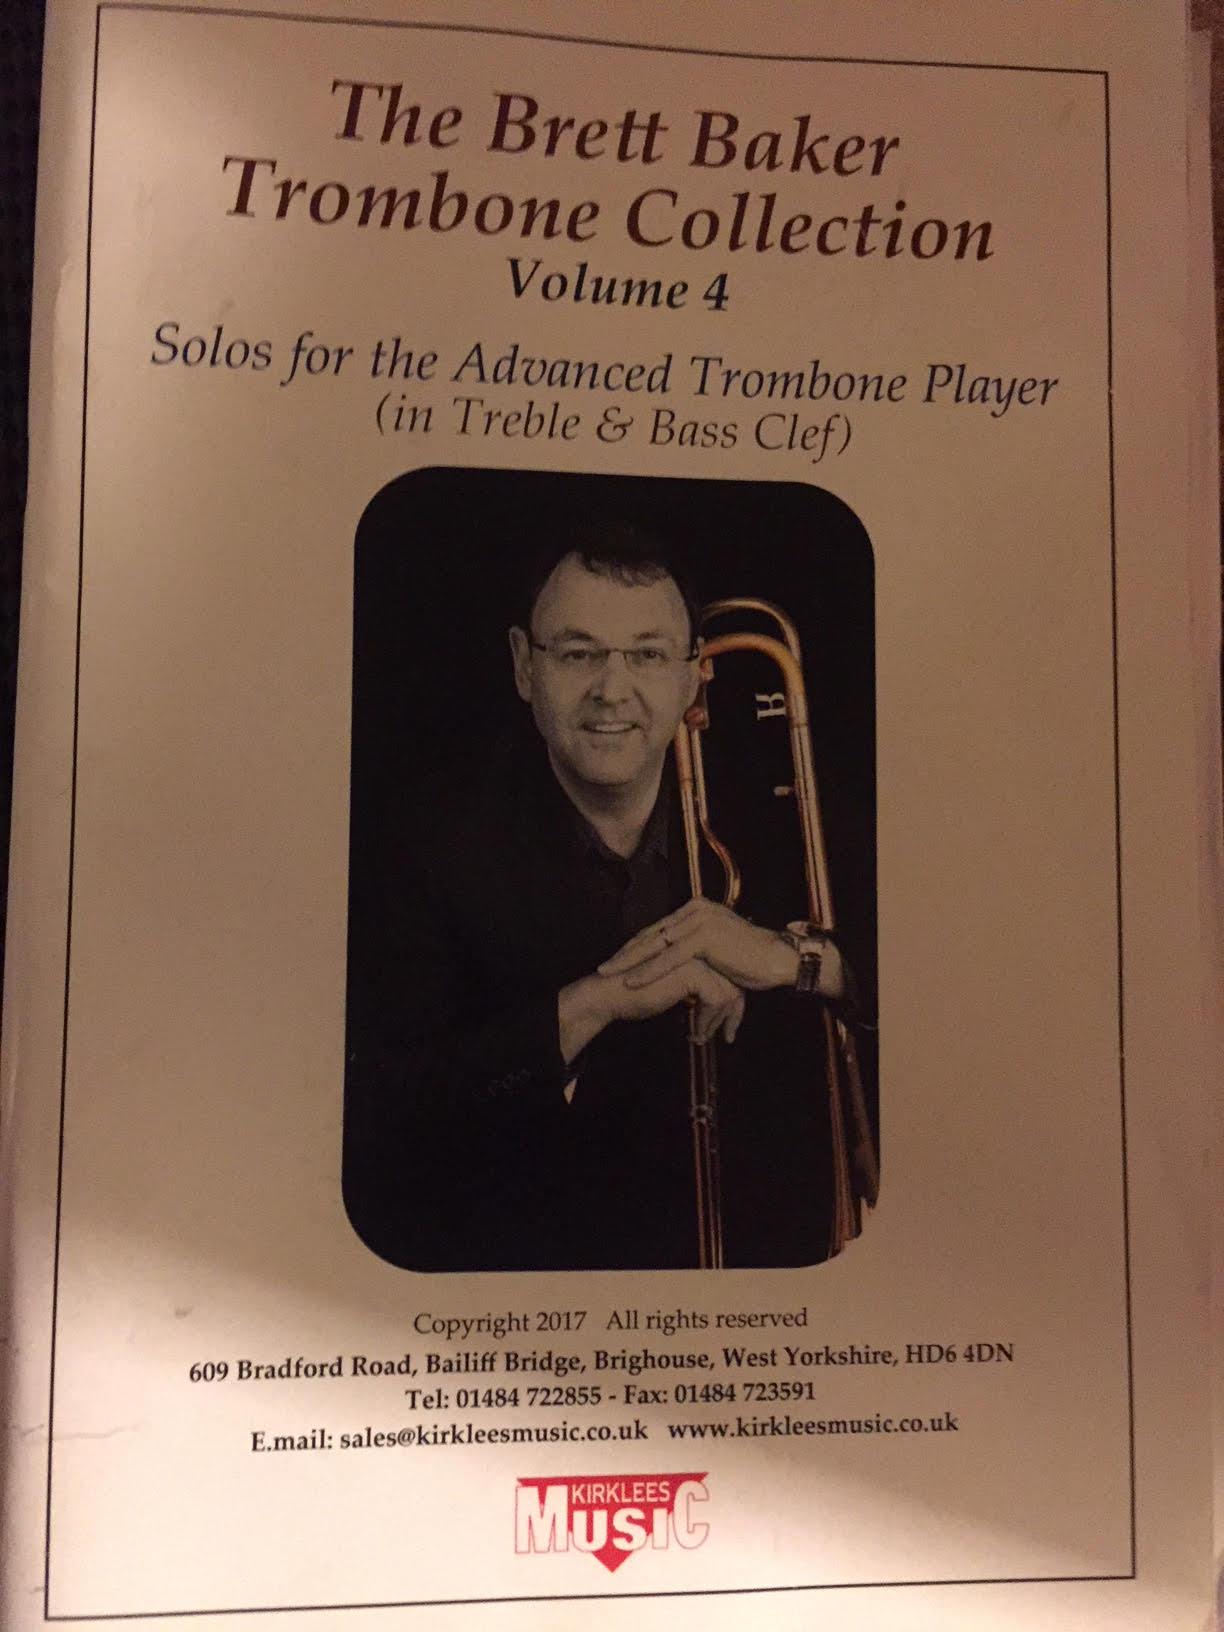 Sheet Music - The Brett Baker Trombone Collection Vol. 4